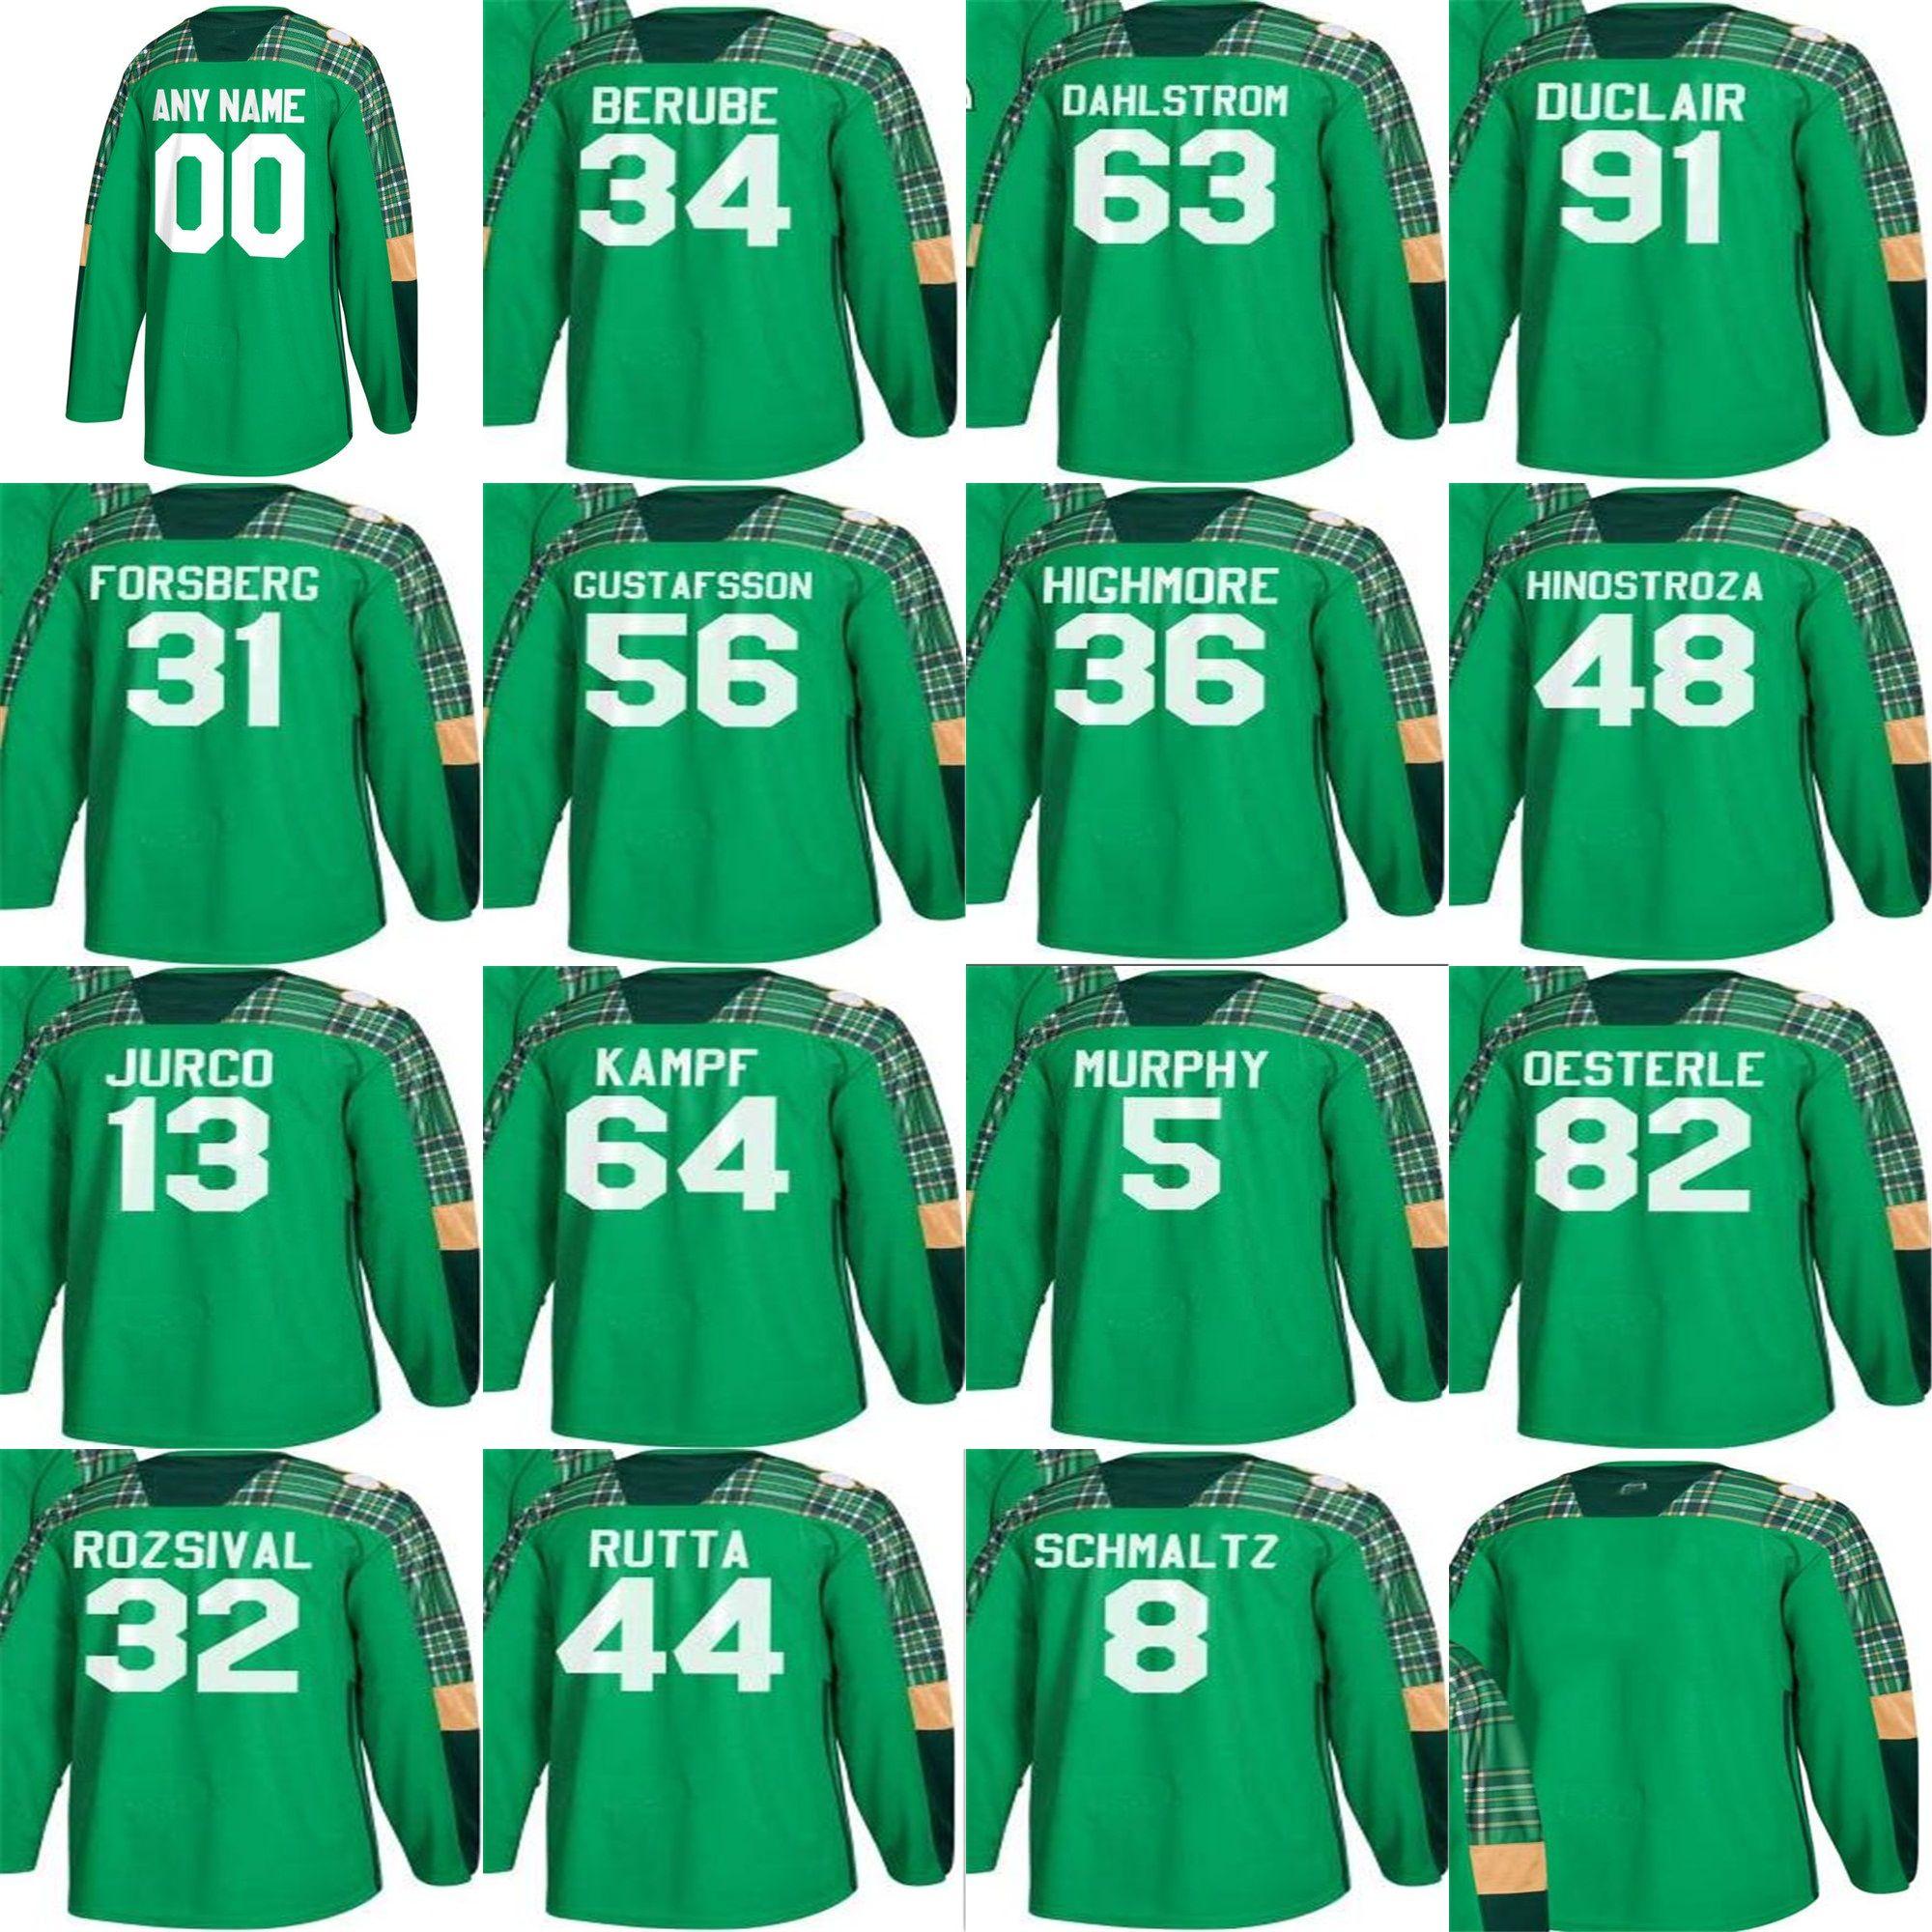 d779606d5 2018 Men 2018 Chicago Blackhawks 63 Carl Dahlstrom Jean Francois Berube  Anton Forsberg 91 Anthony Duclair St. Patrick S Day Custom Hockey Jerseys  From ...